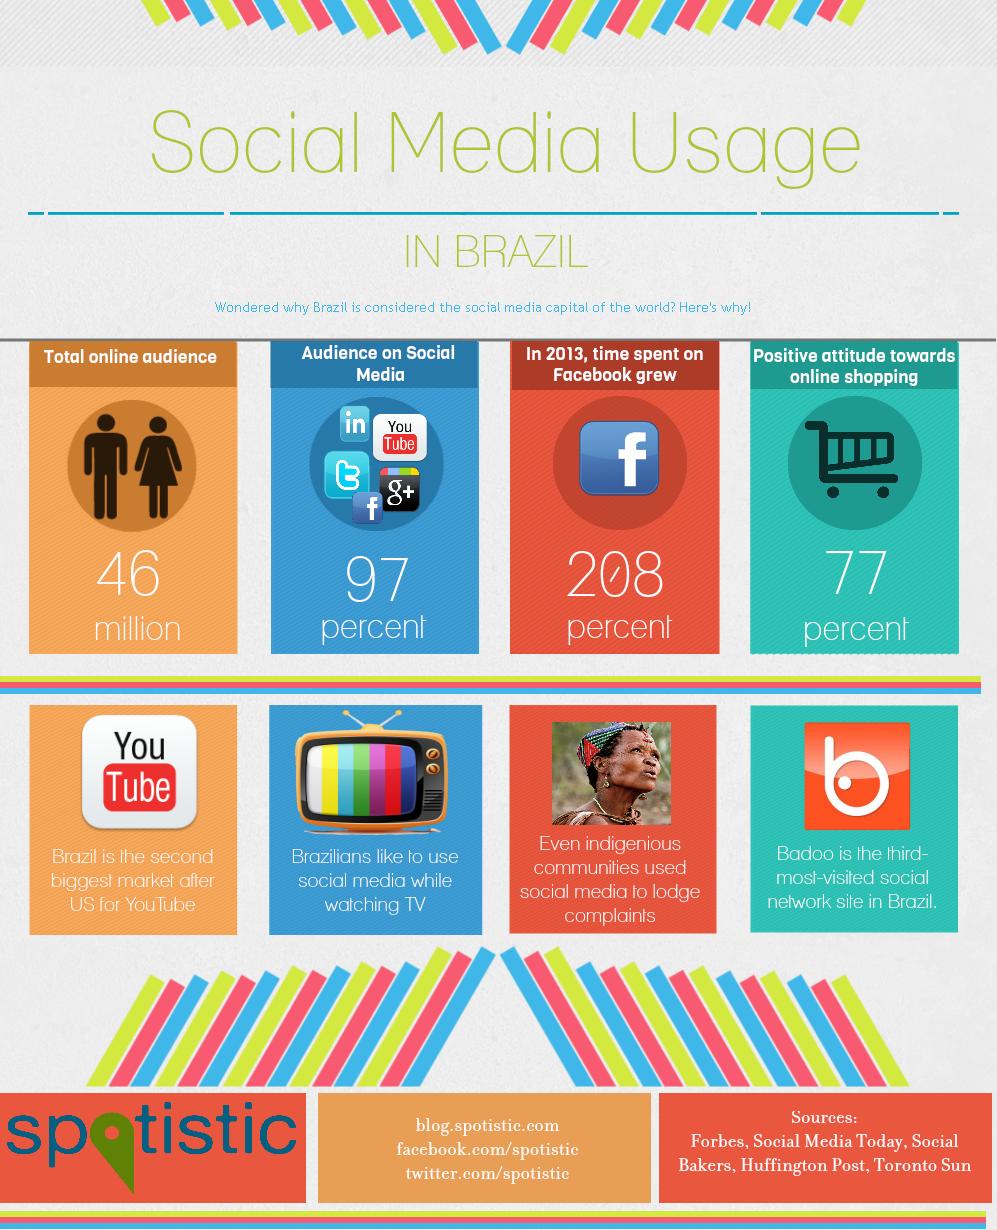 brazil-social-media-usage__final-final-final